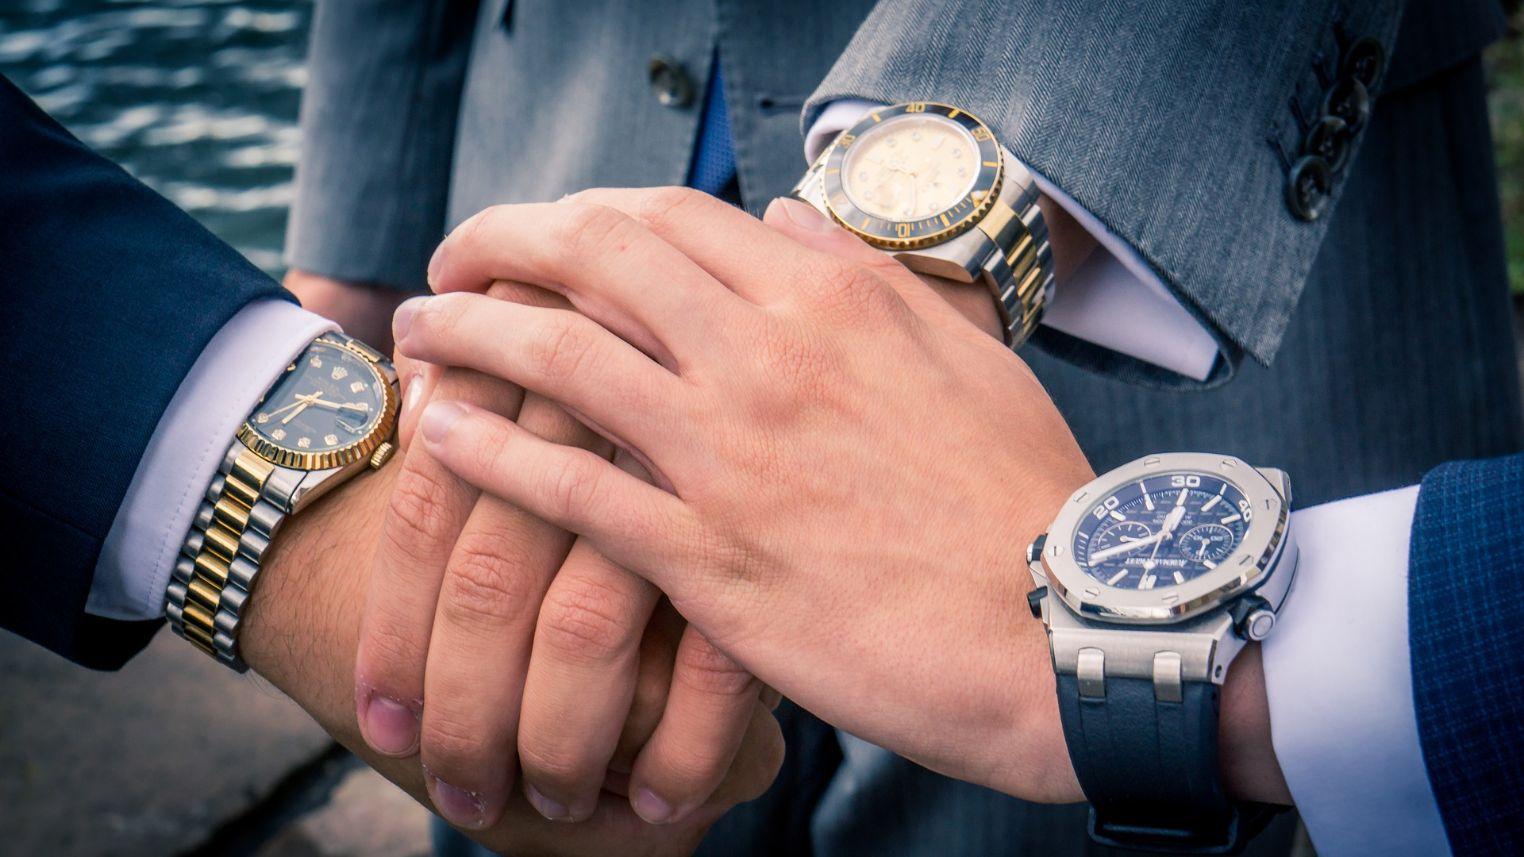 3 Luxus Uhren am Handgelenk